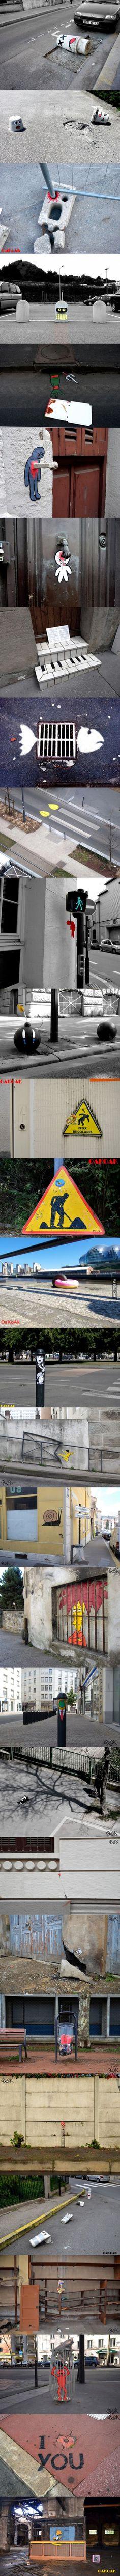 Creative and Funny Street Art